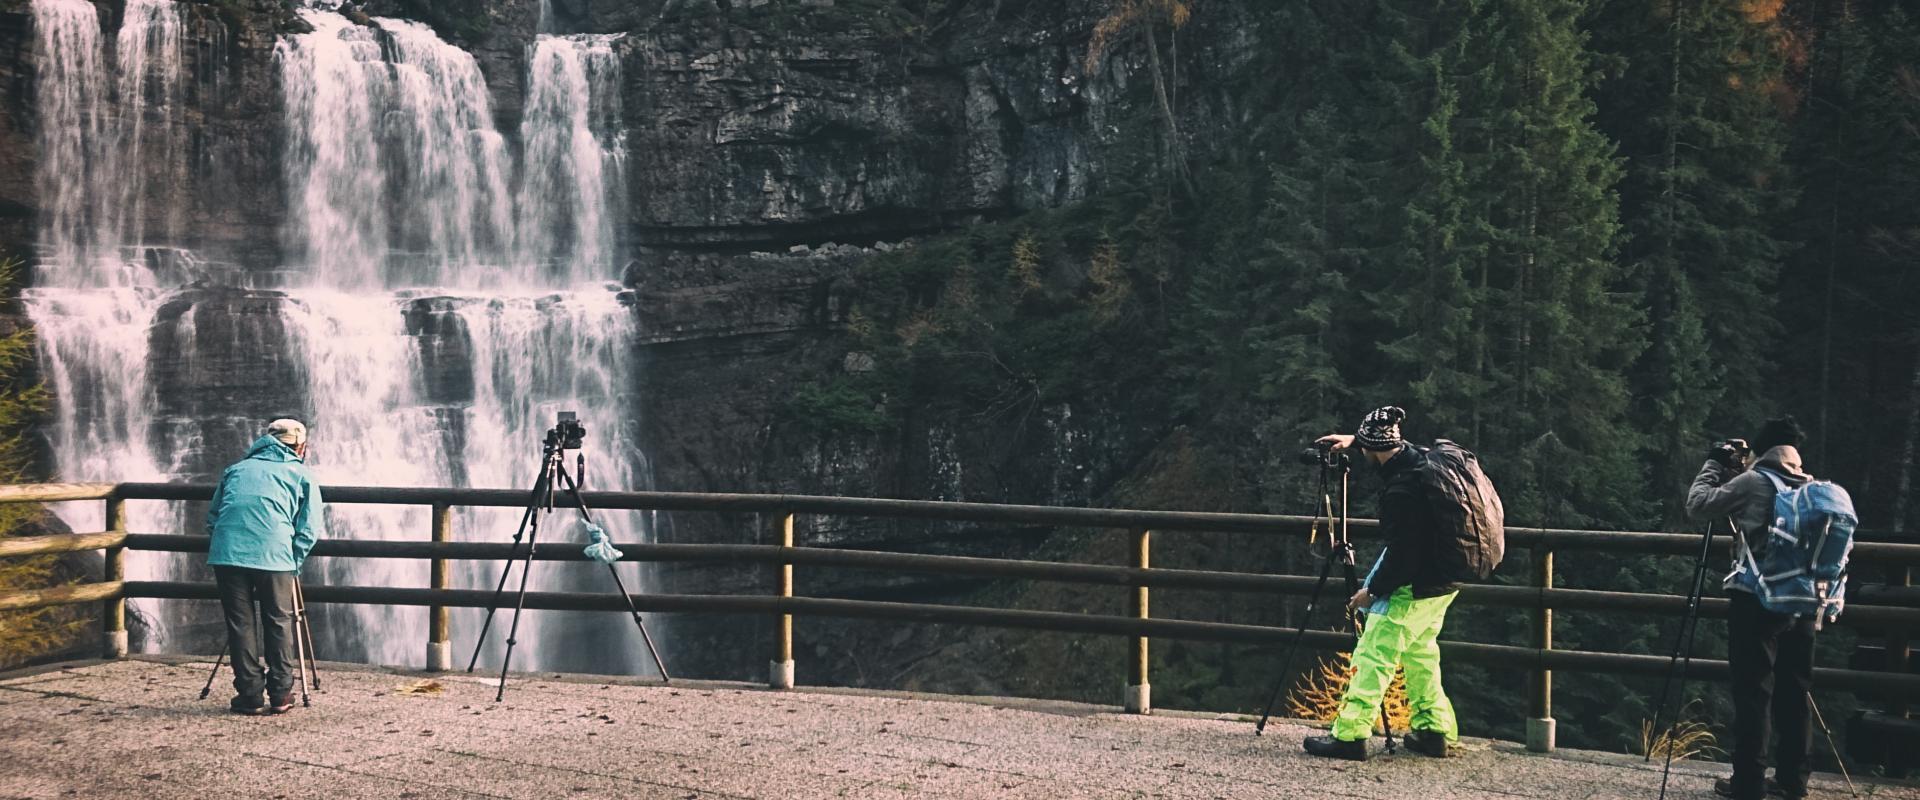 Vallesinella waterfalls escursion